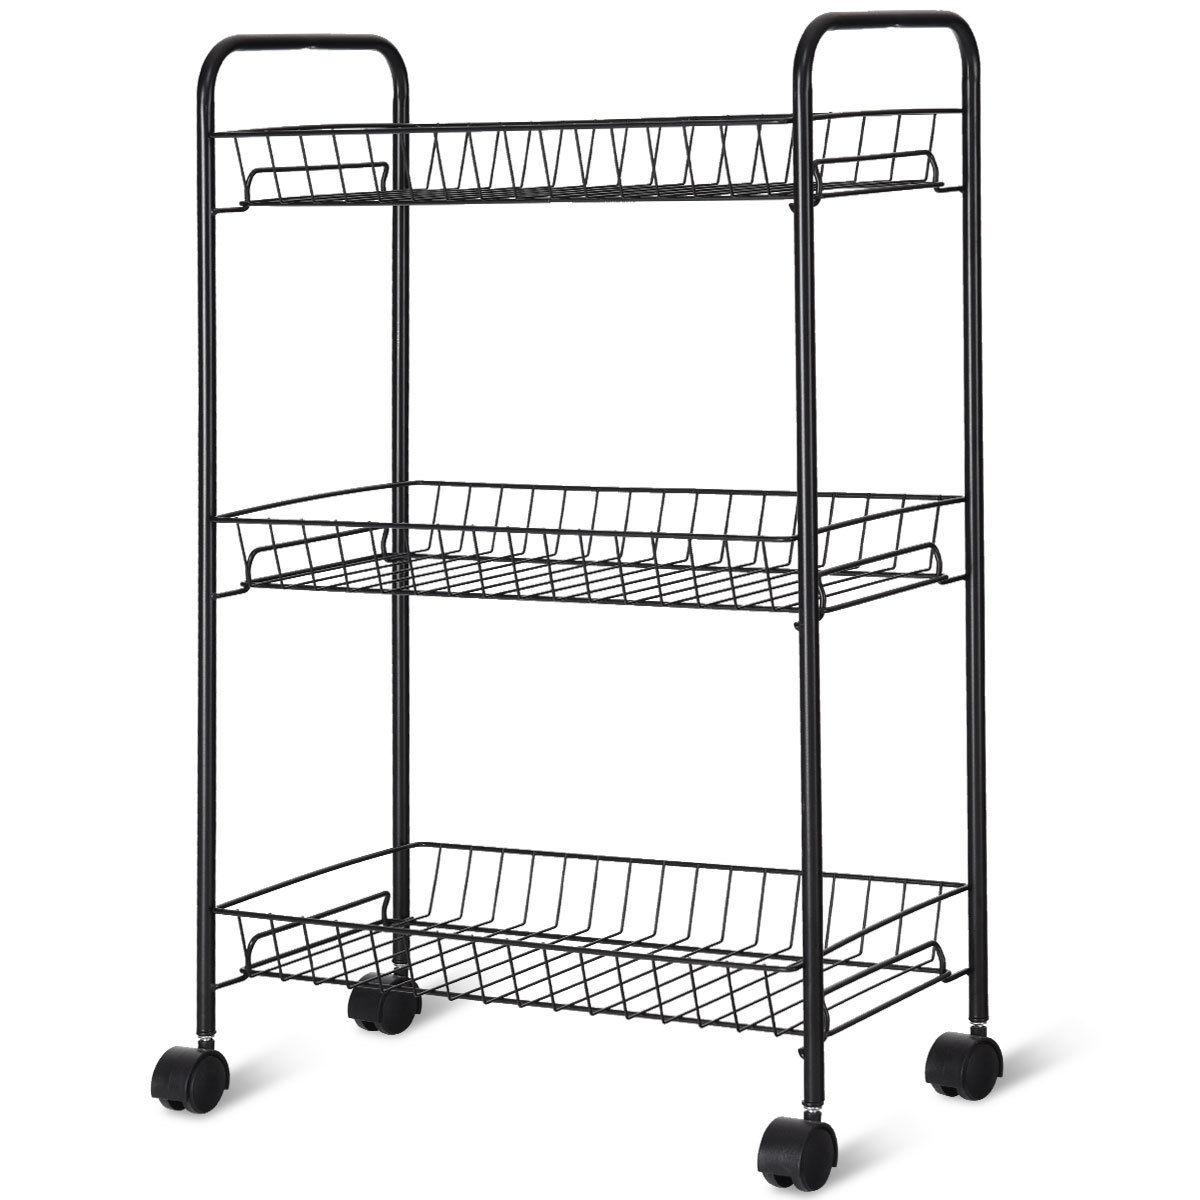 3-Tier Mesh Wire Basket Rolling Cart Kitchen Storage Cart with Wheels Shelving Wire Basket Shelf Trolley Silver